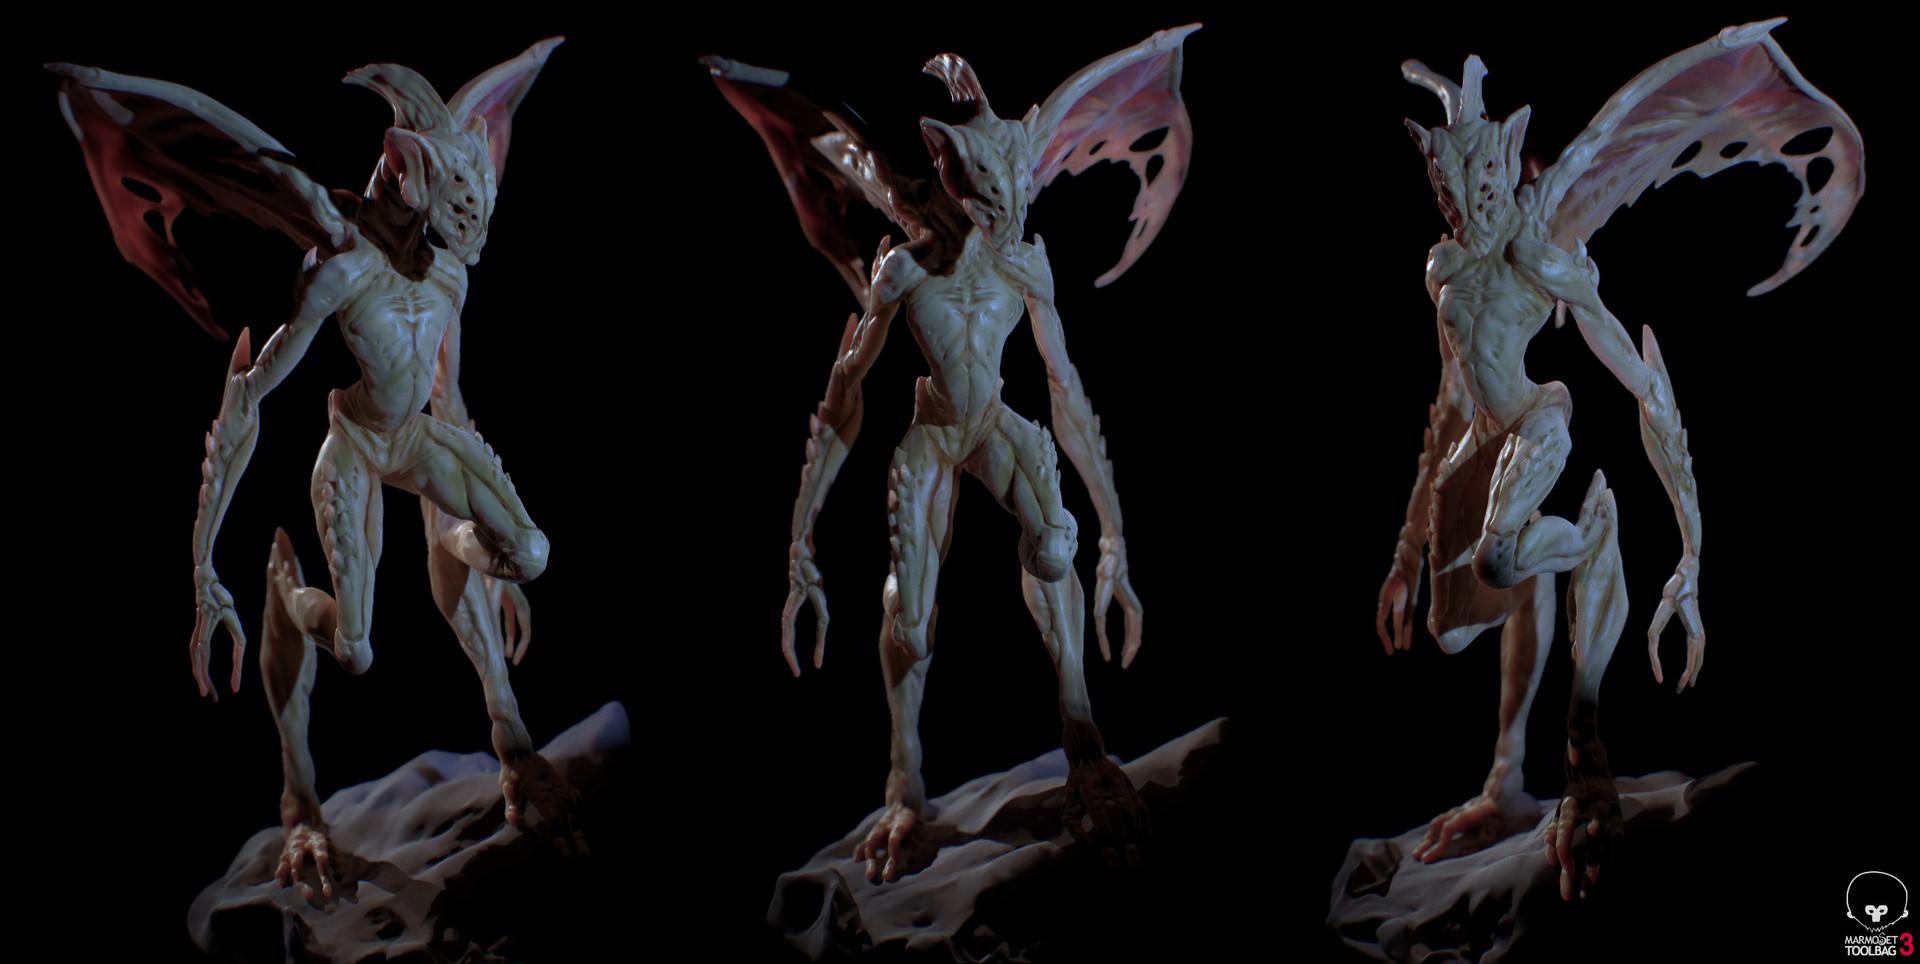 Ilhan yilmaz creature render 06